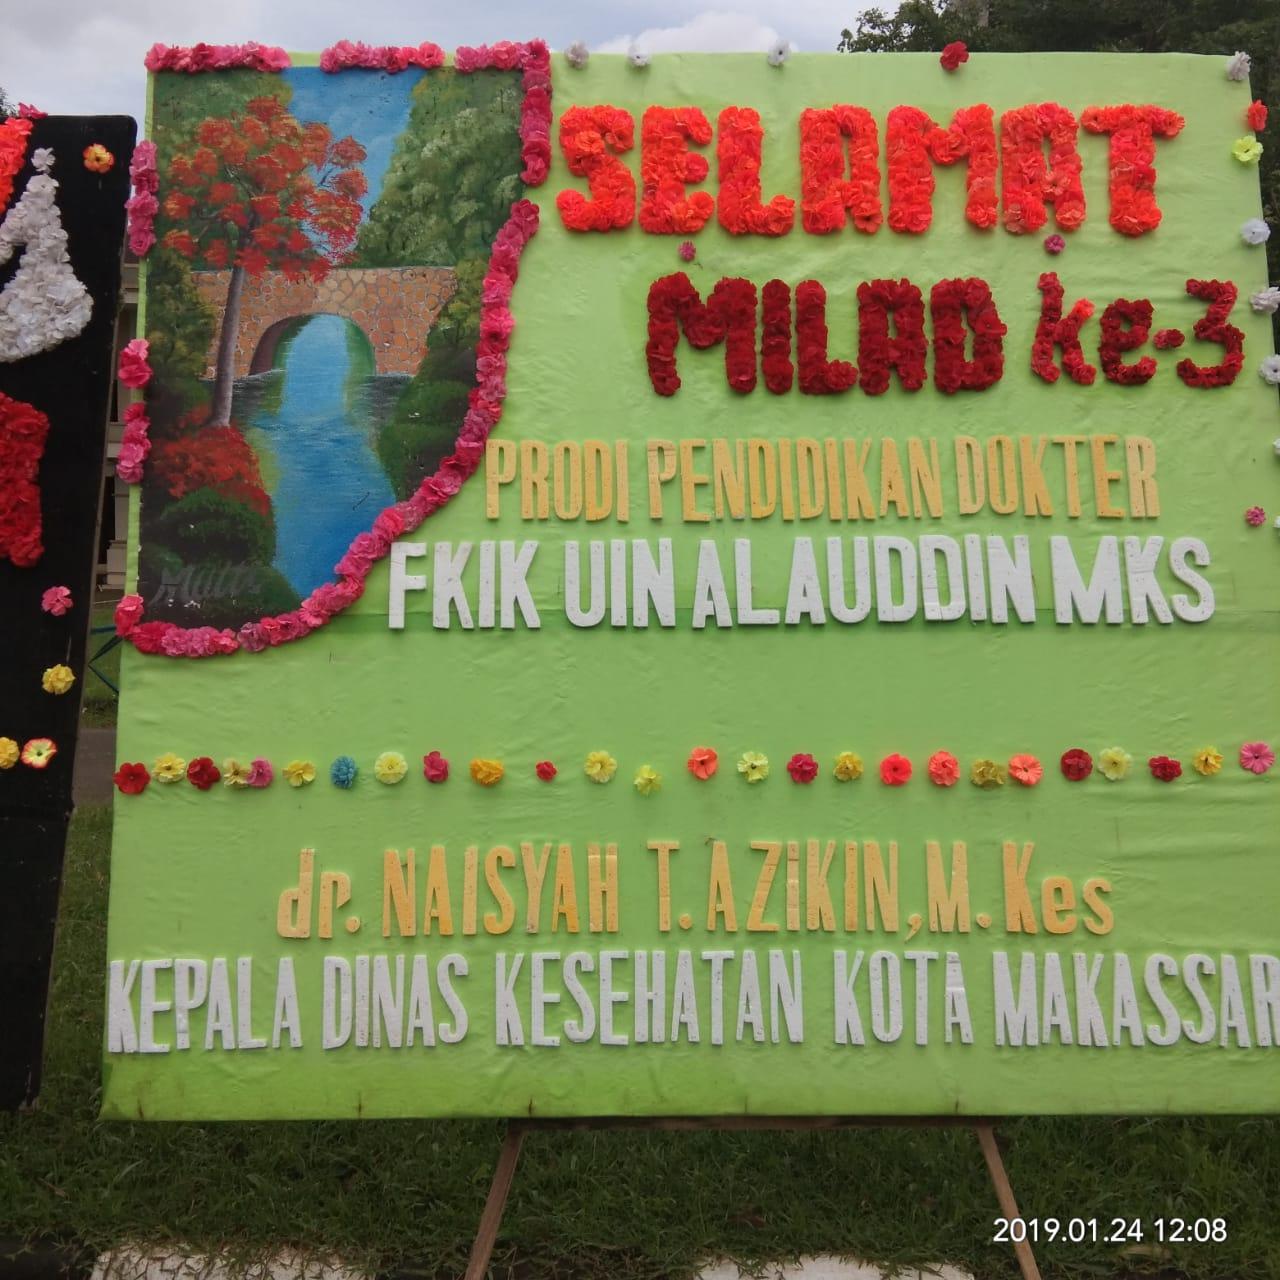 Ucapan Selamat Milad Ke 3 PSPD oleh Kepala Dinkes Kota Makassar